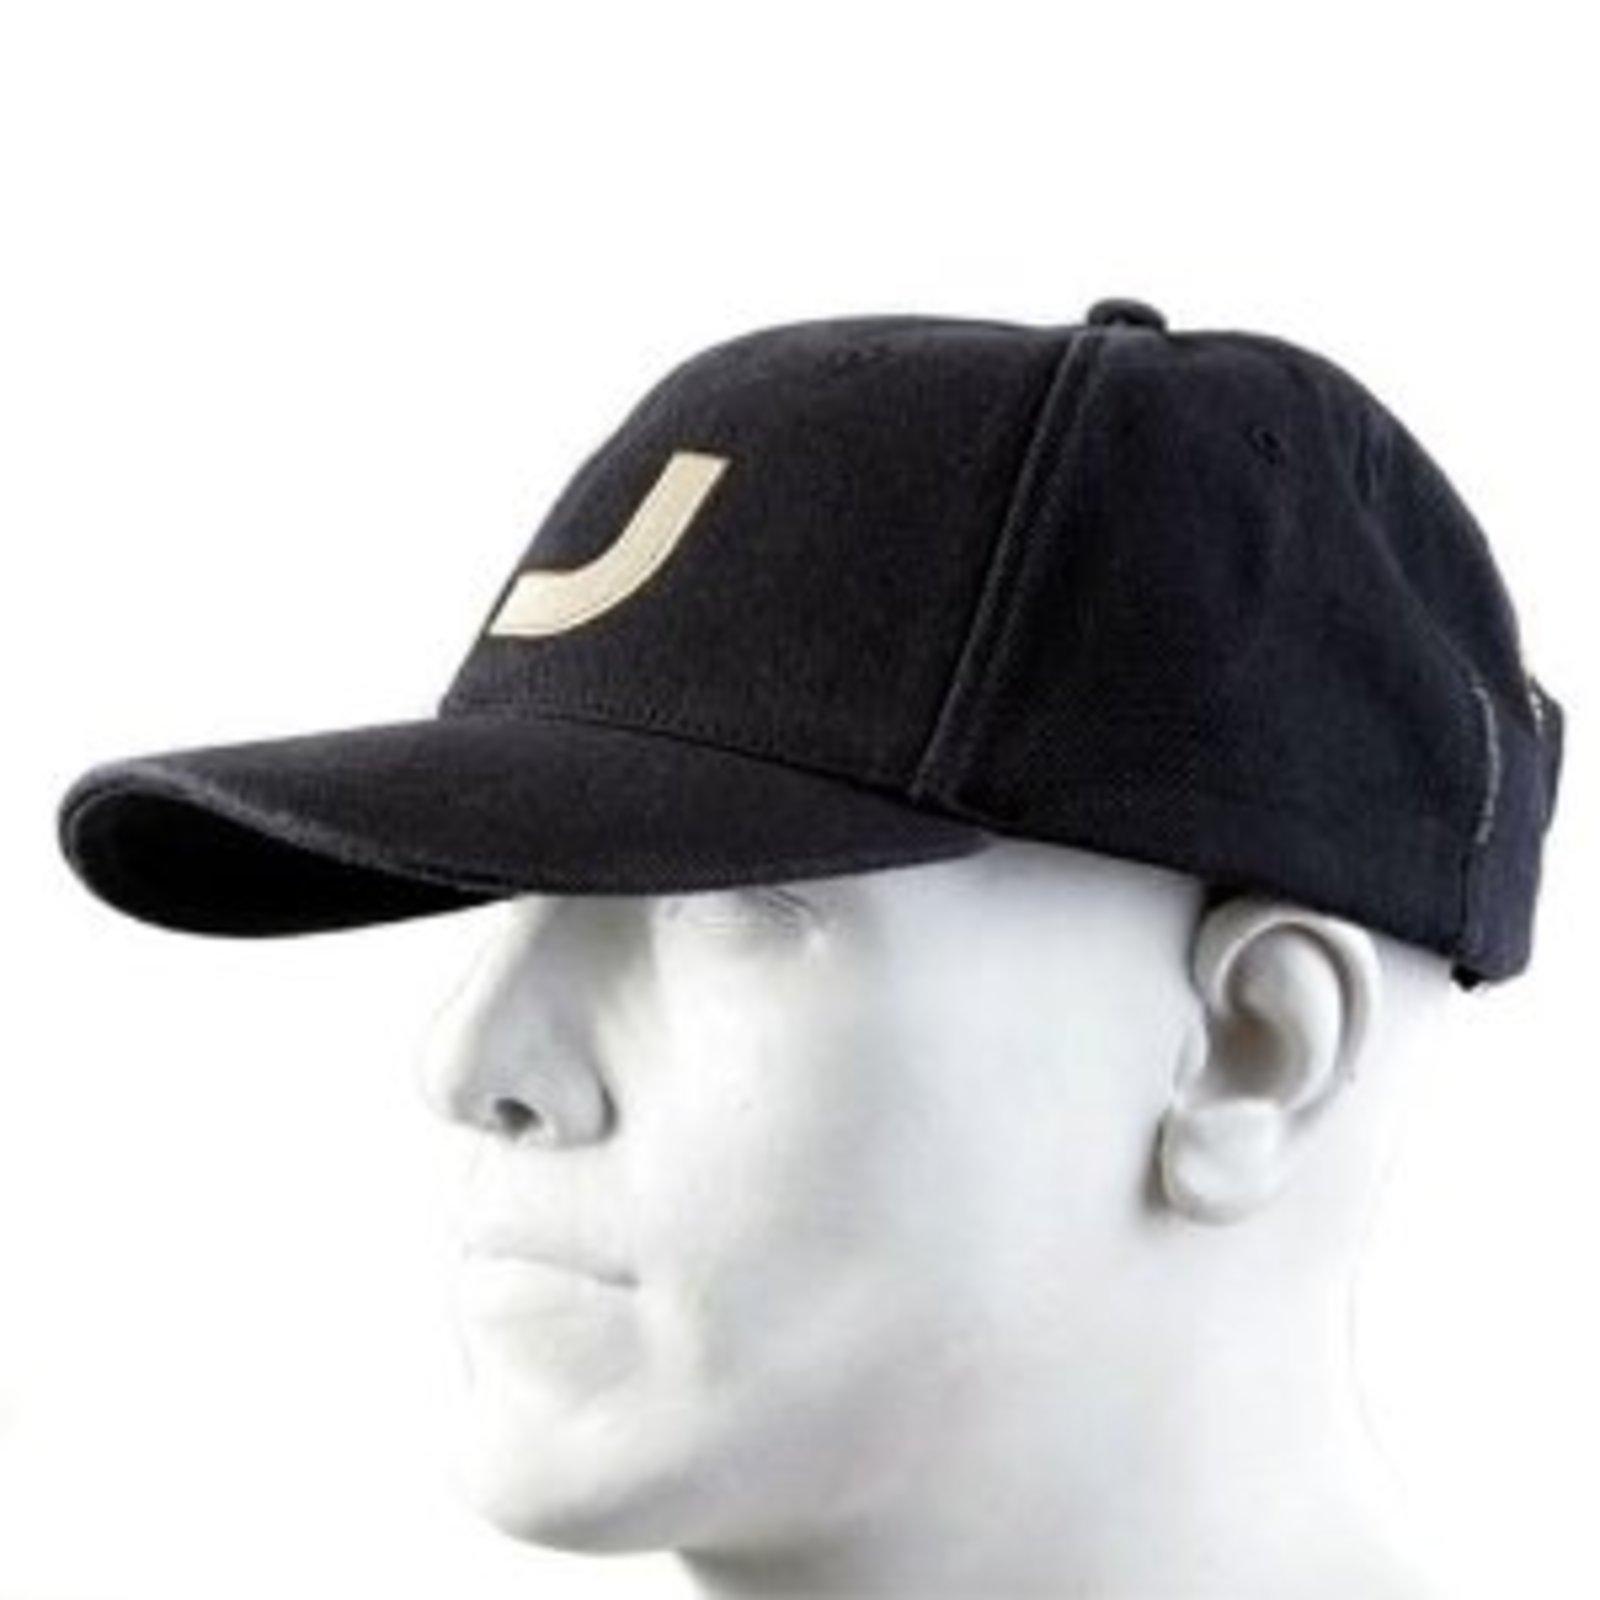 Armani Jeans Designer Caps 0648OXE Black cap AJM7514 at Togged Clothing 7252a65fa36